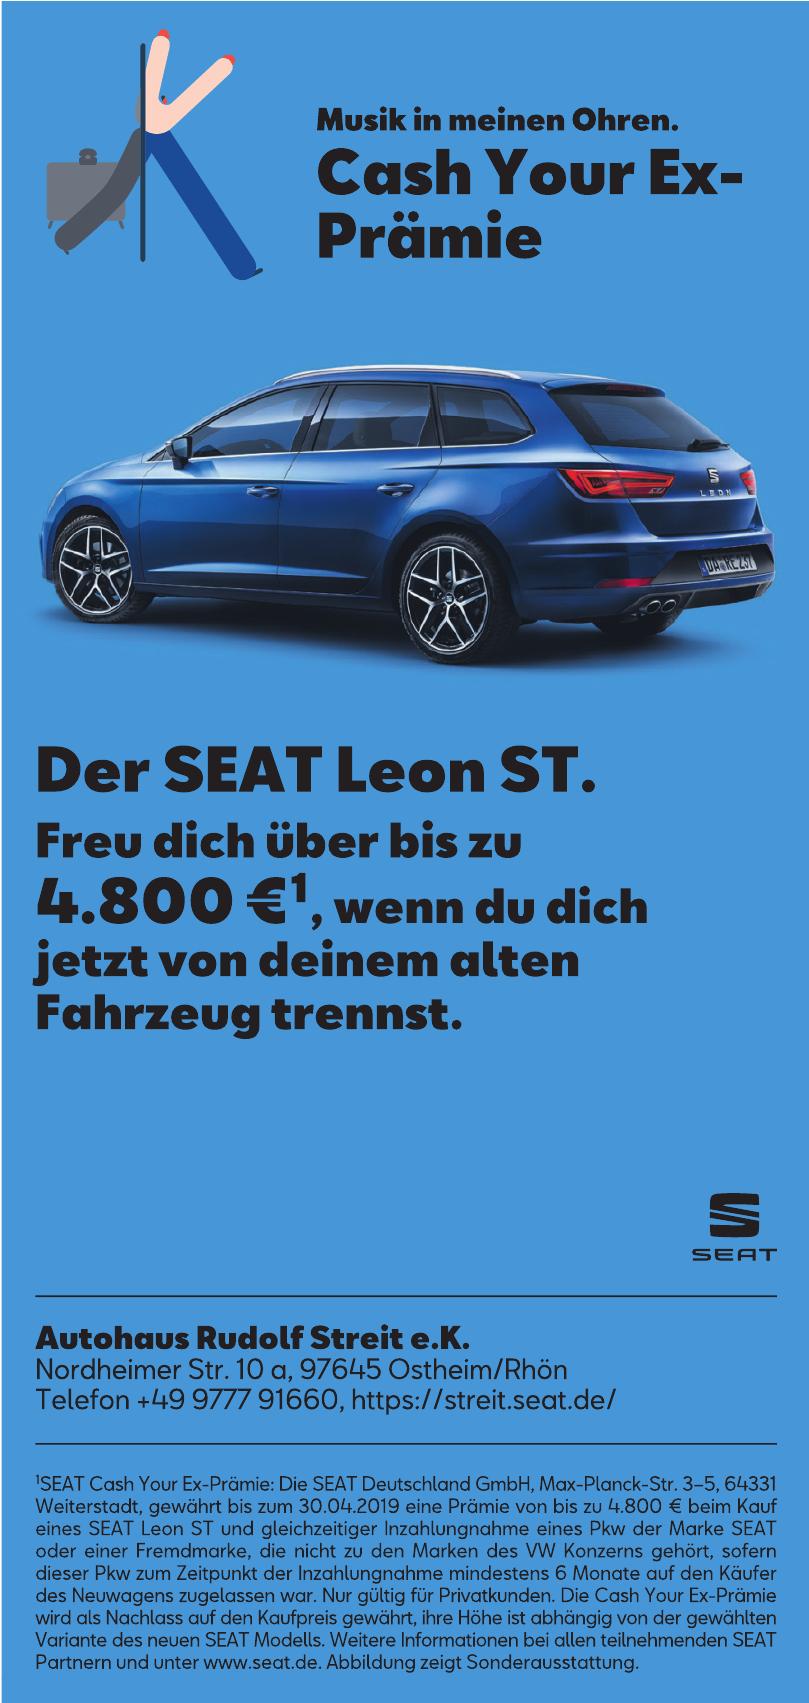 Autohaus Streit - SEAT Autohaus Rudolf Streit e.K.